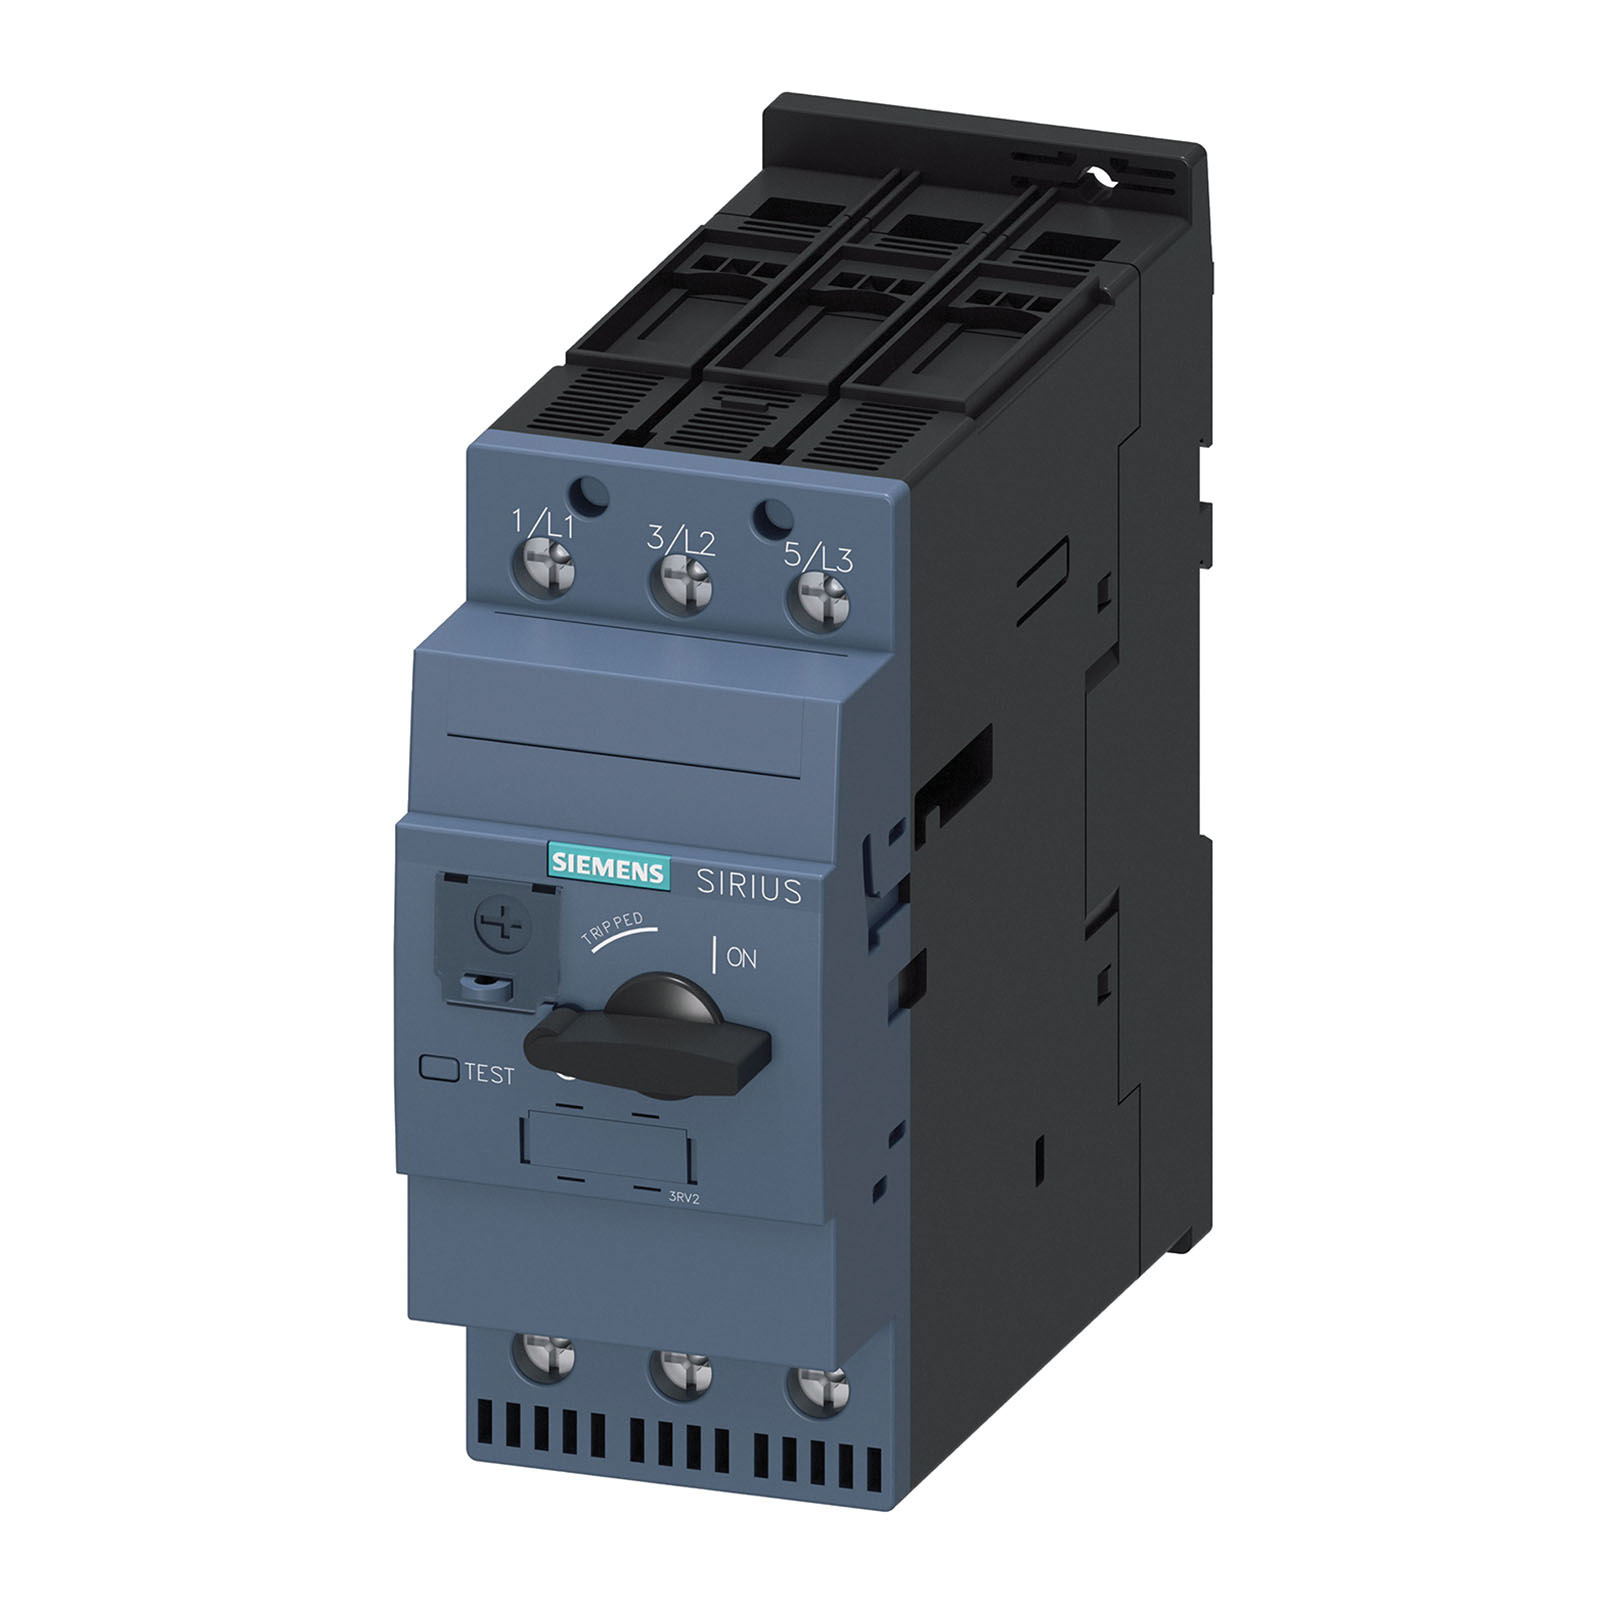 Siemens 3rv2031 4wa10 35 Mm Din Rail Mount Circuit Breaker